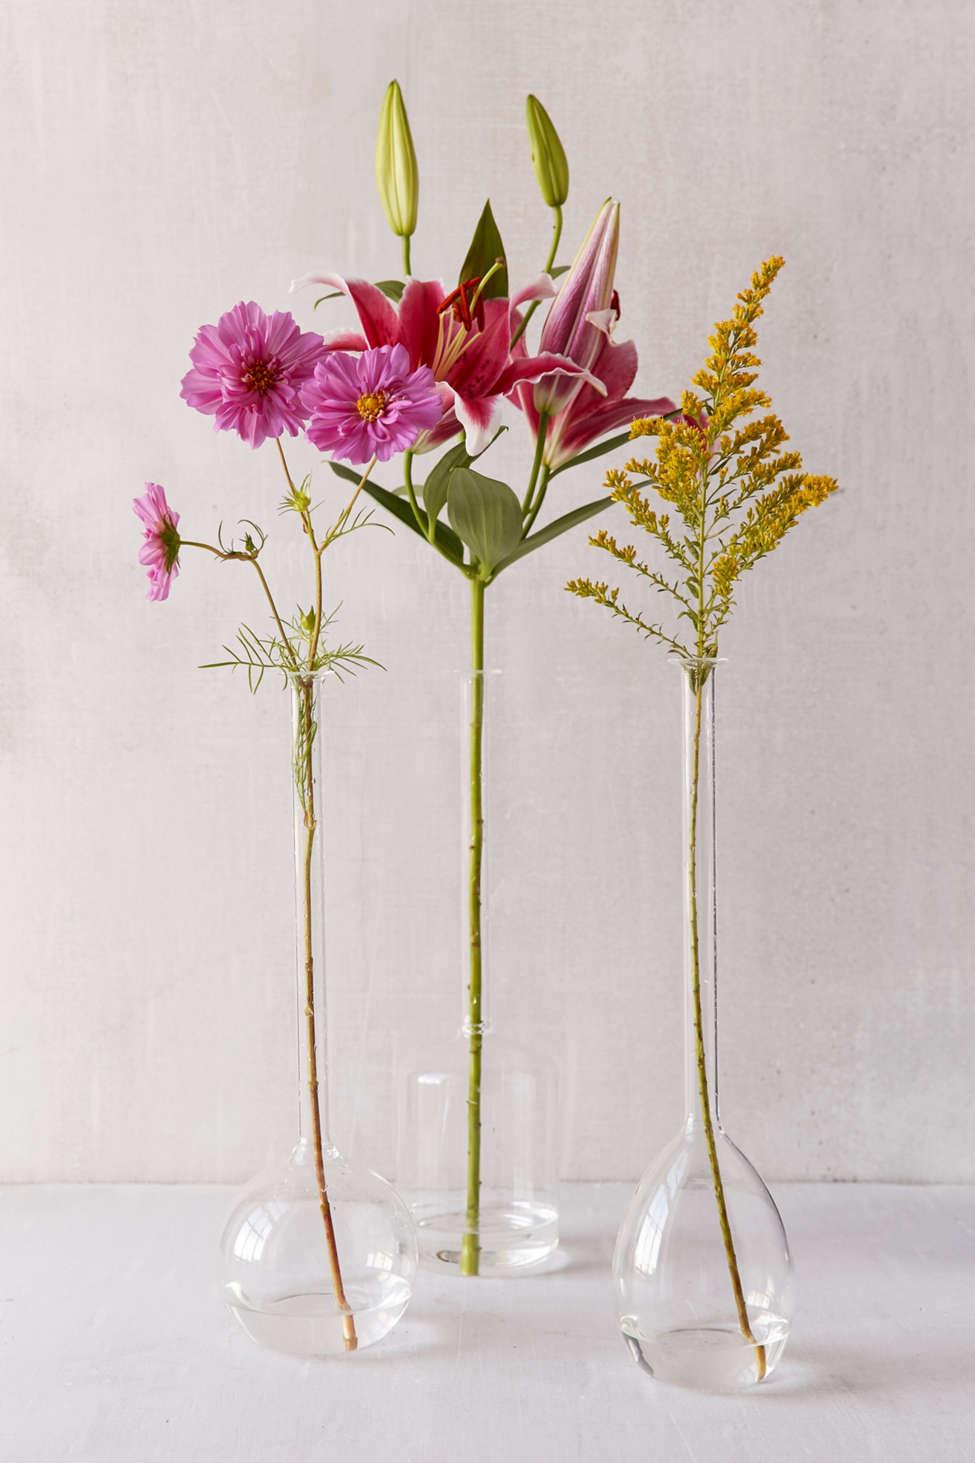 Slide View: 1: Serafina Assorted Vase Trio - Set of 3